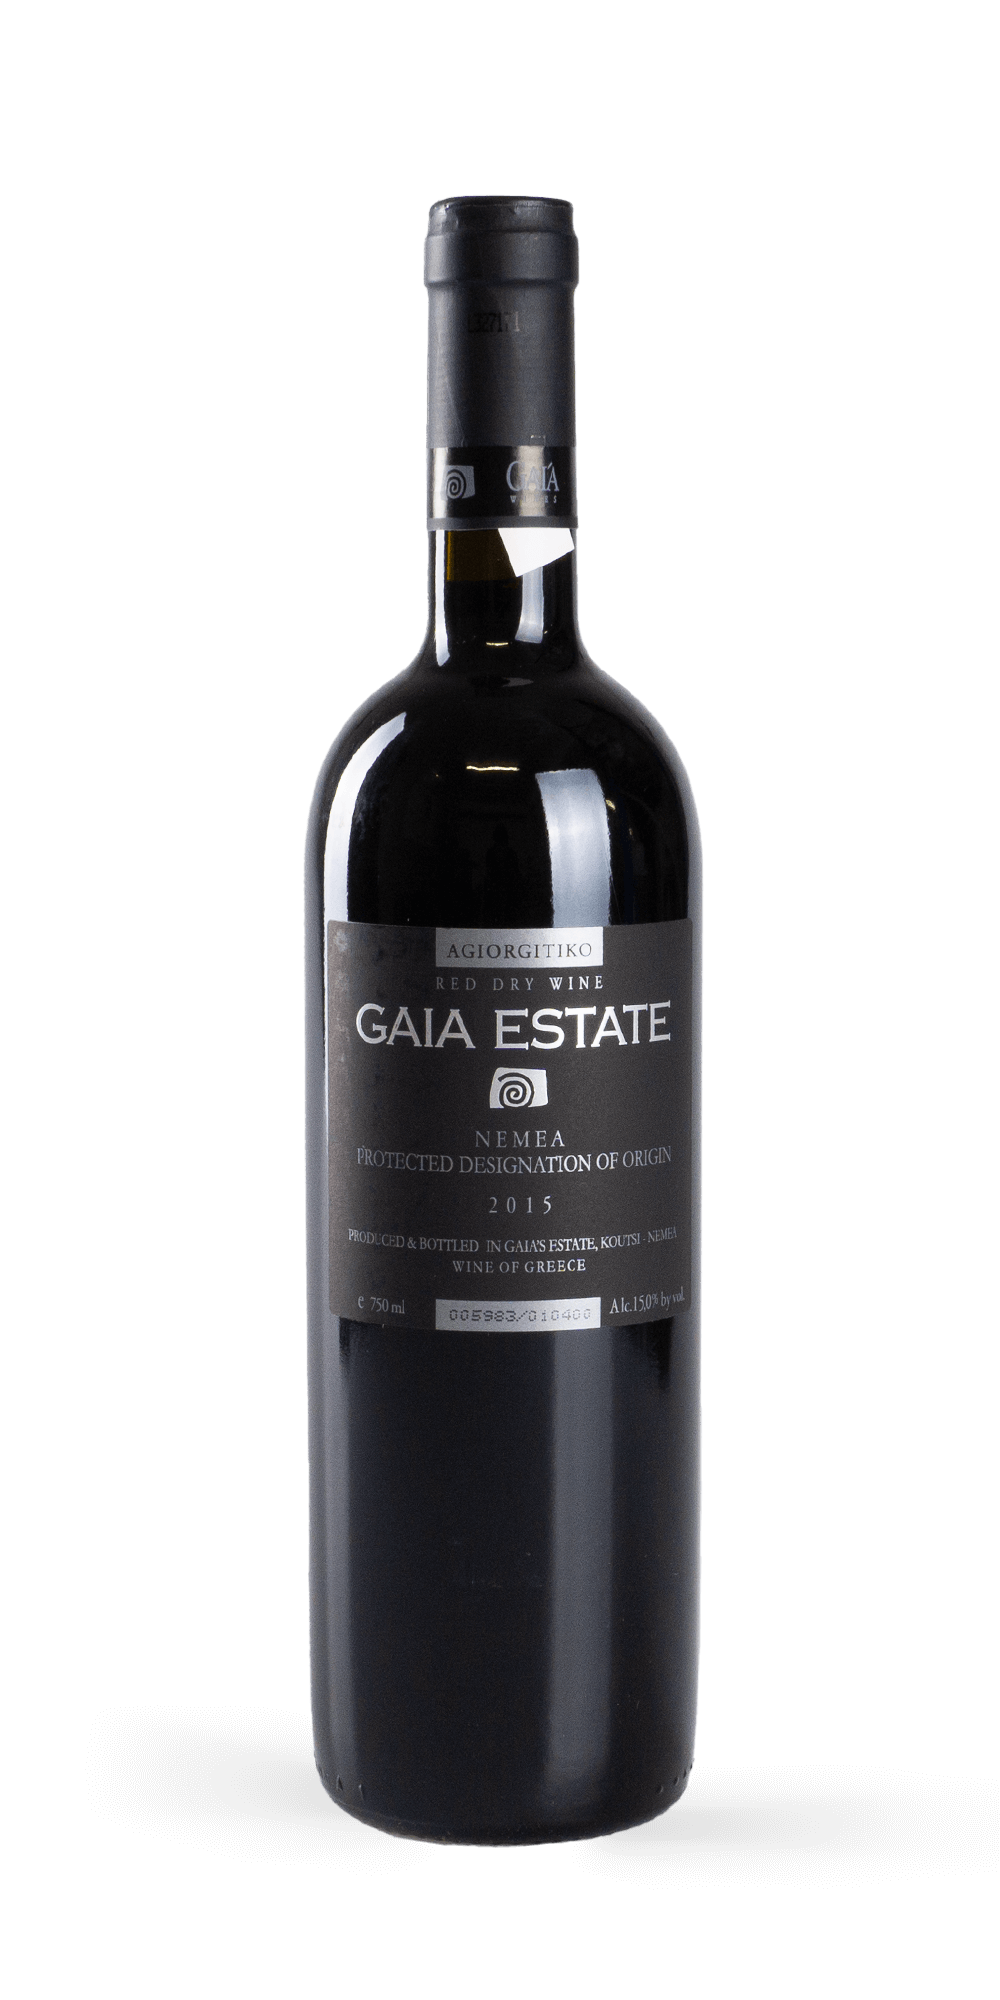 Gaia Estate 2015 - Gaia Wines